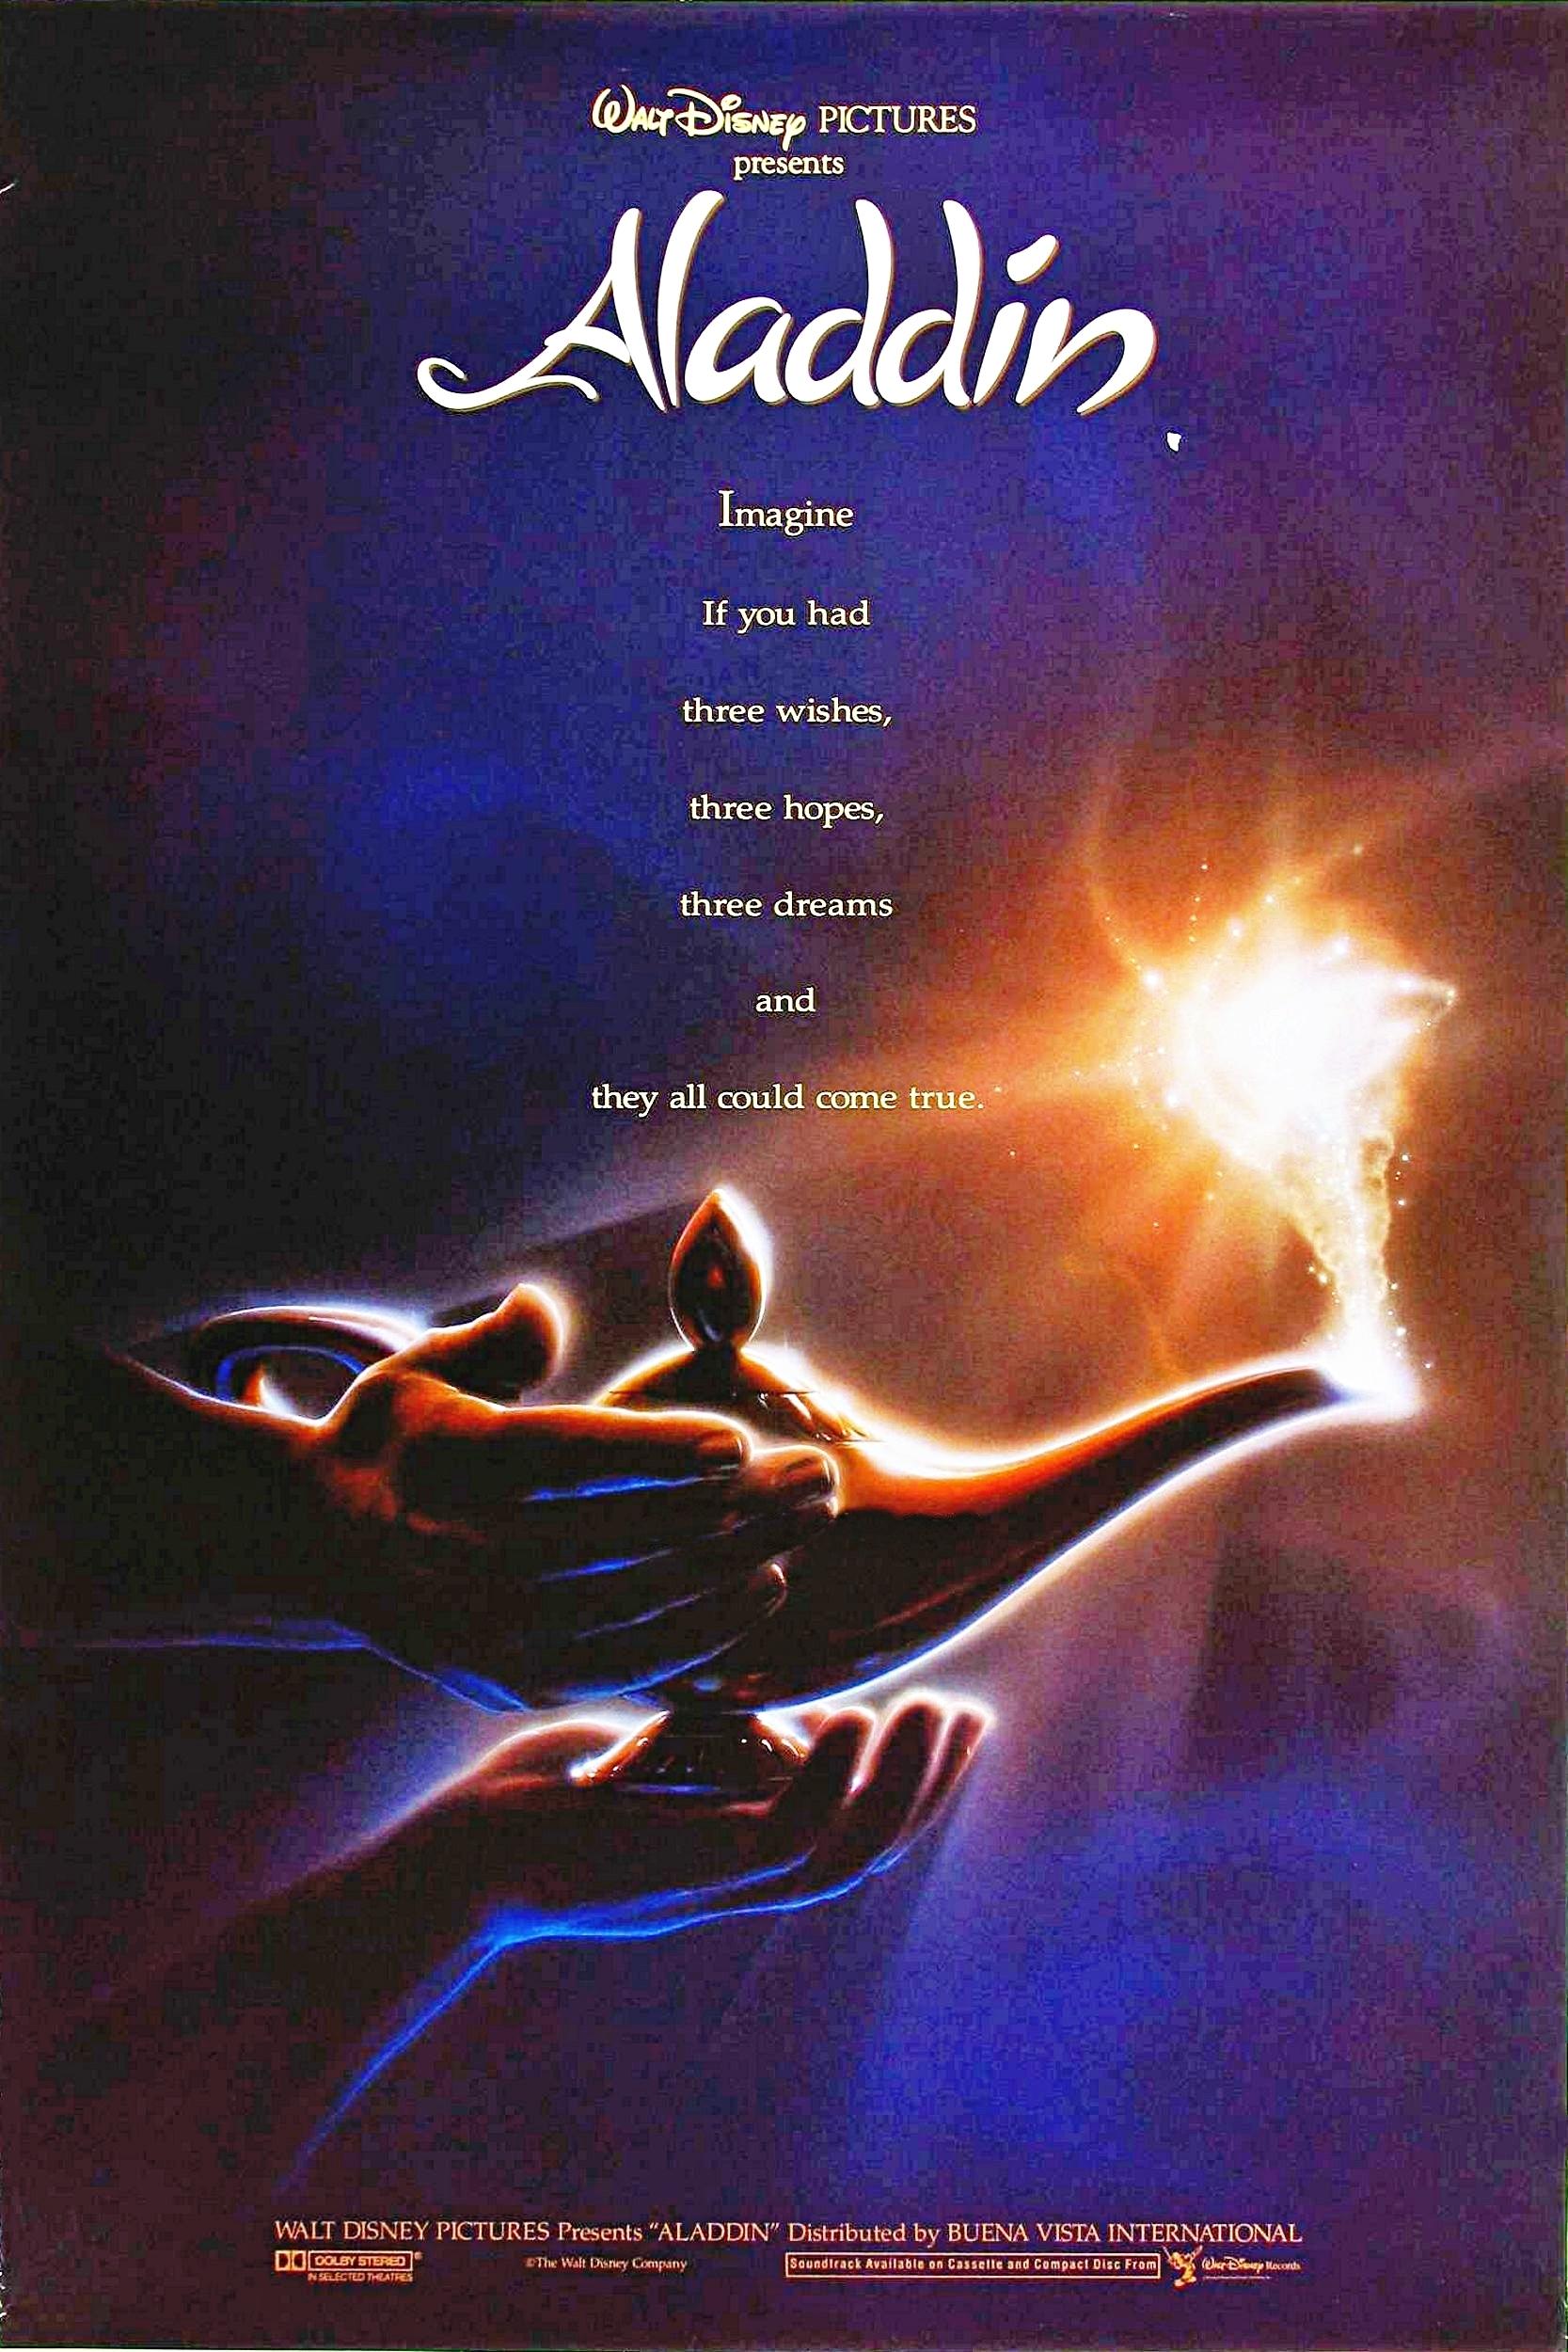 Aladdin Movie Poster The time Disney...